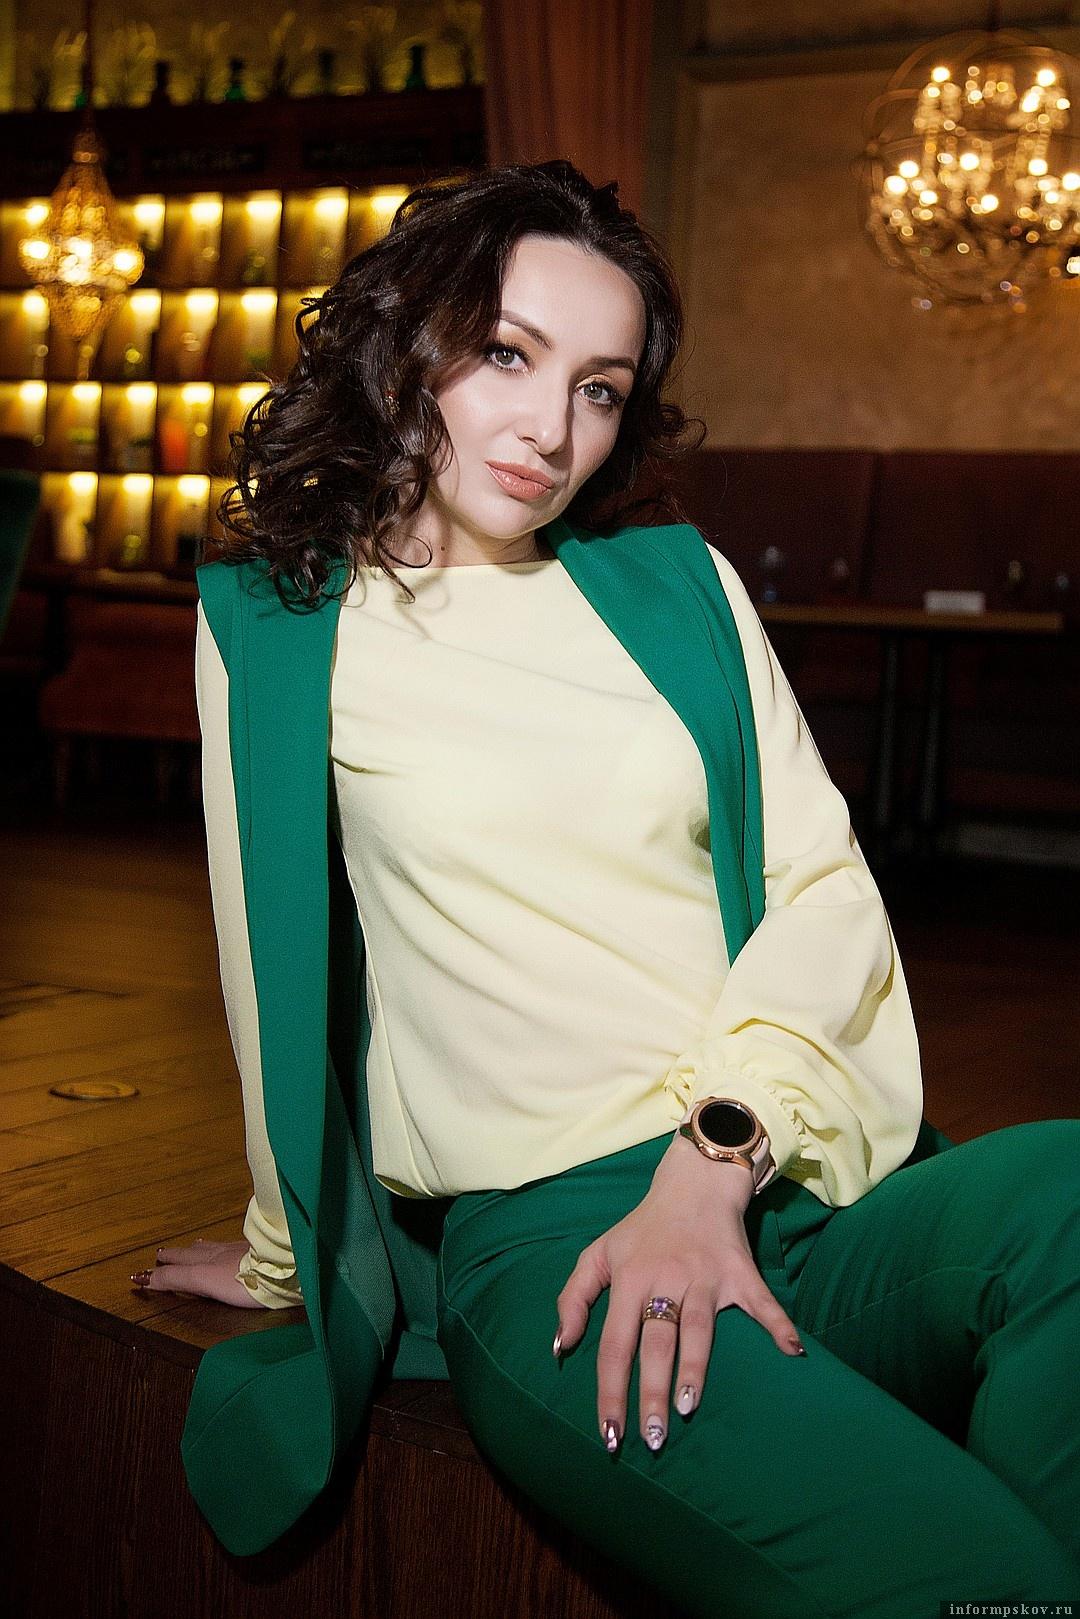 Татьяна Степанова. Фото - Татьяна Родина